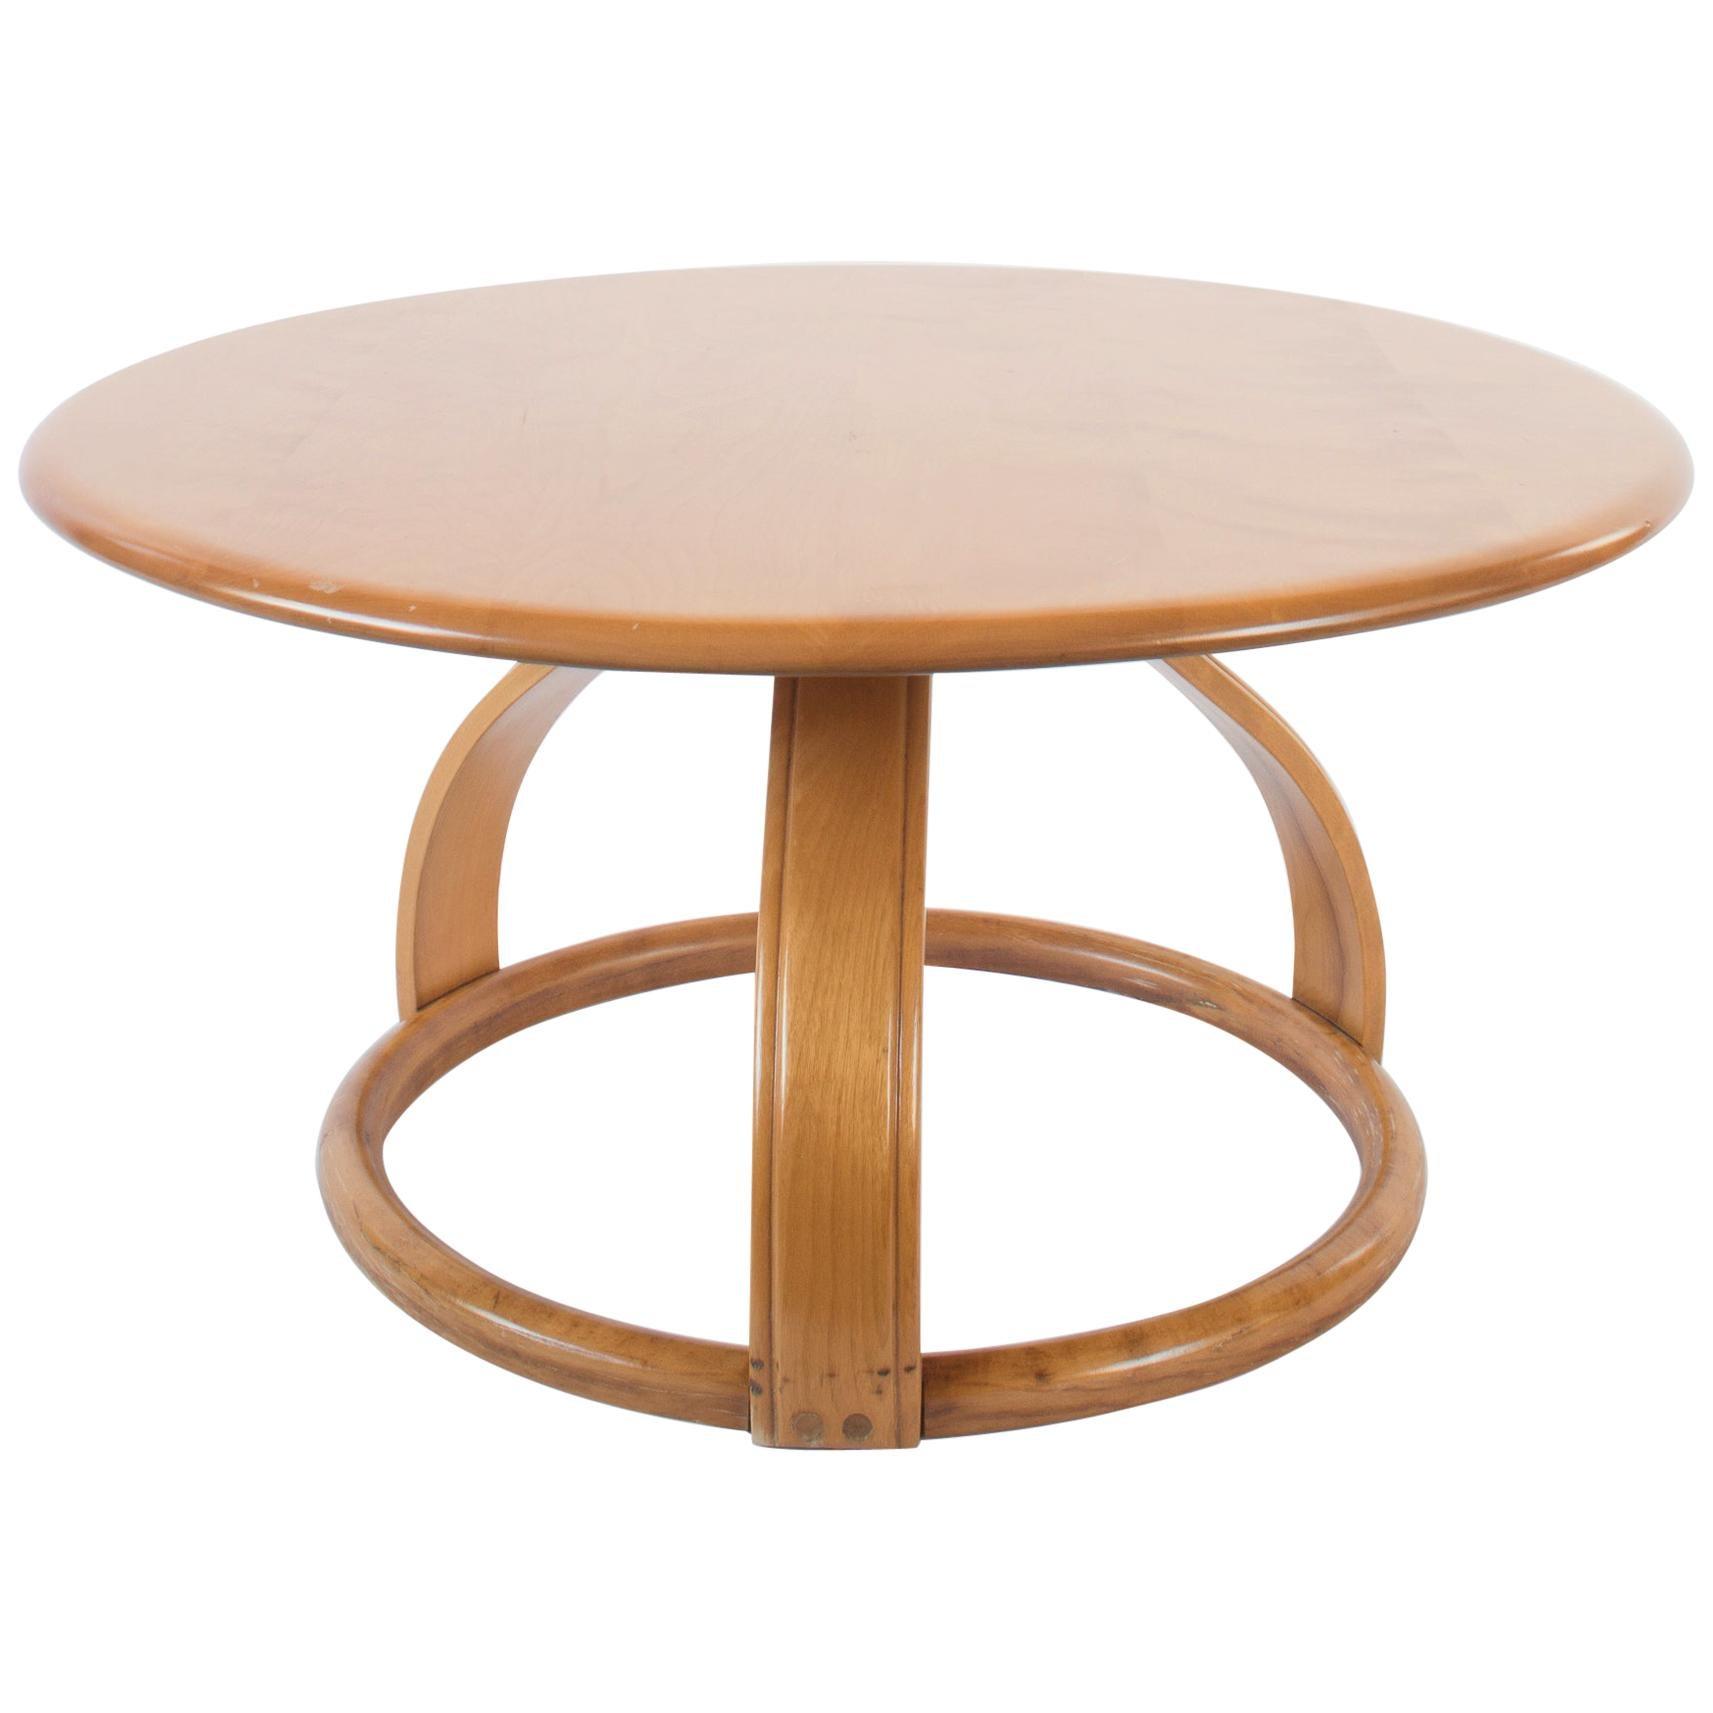 Heywood Wakefield Round Low Table